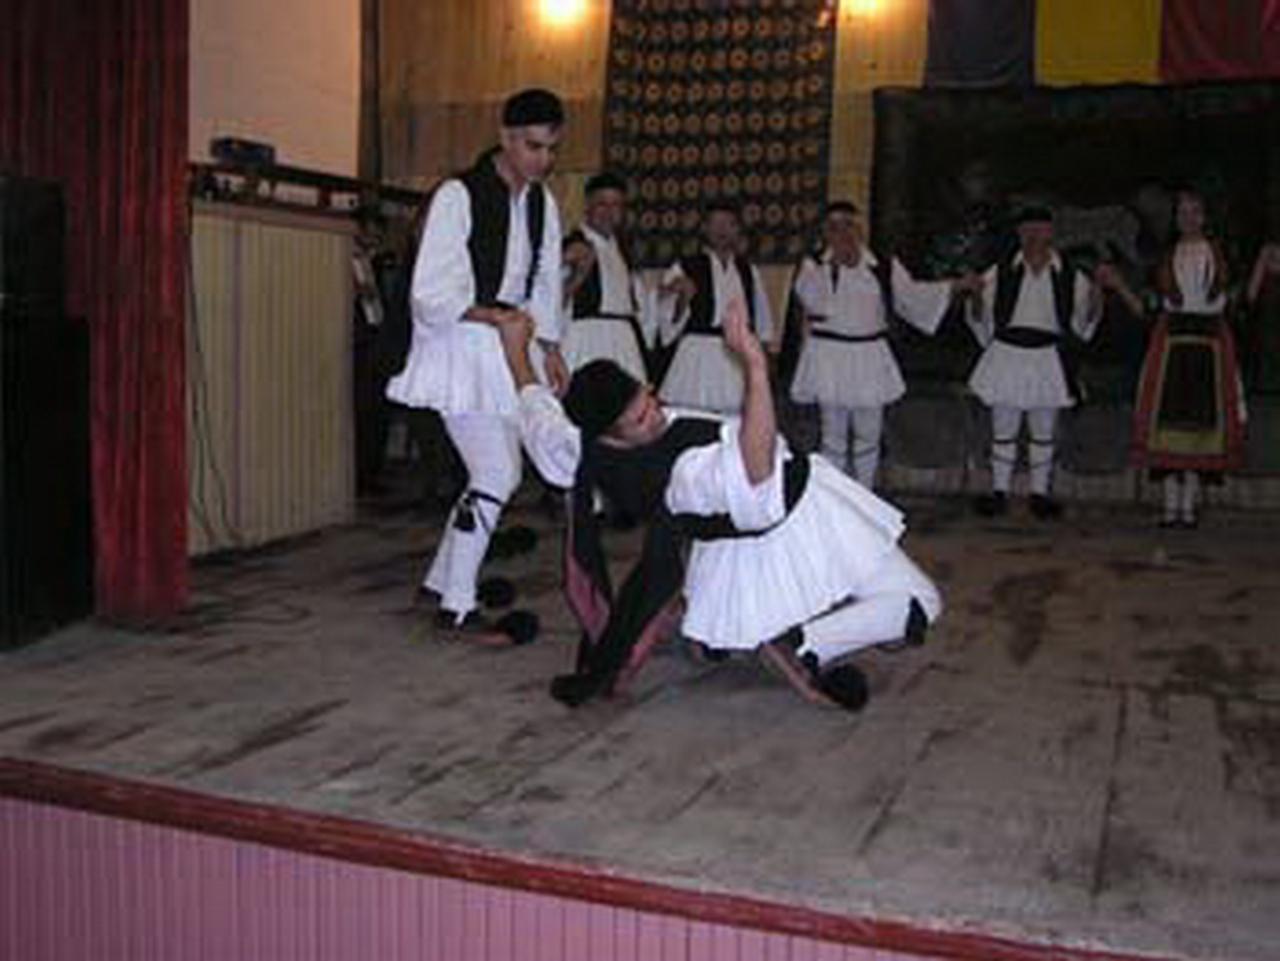 2005 - Ansamblul folcloric \'\'New Krini Group Agia Paraskevi\'\' - Grecia